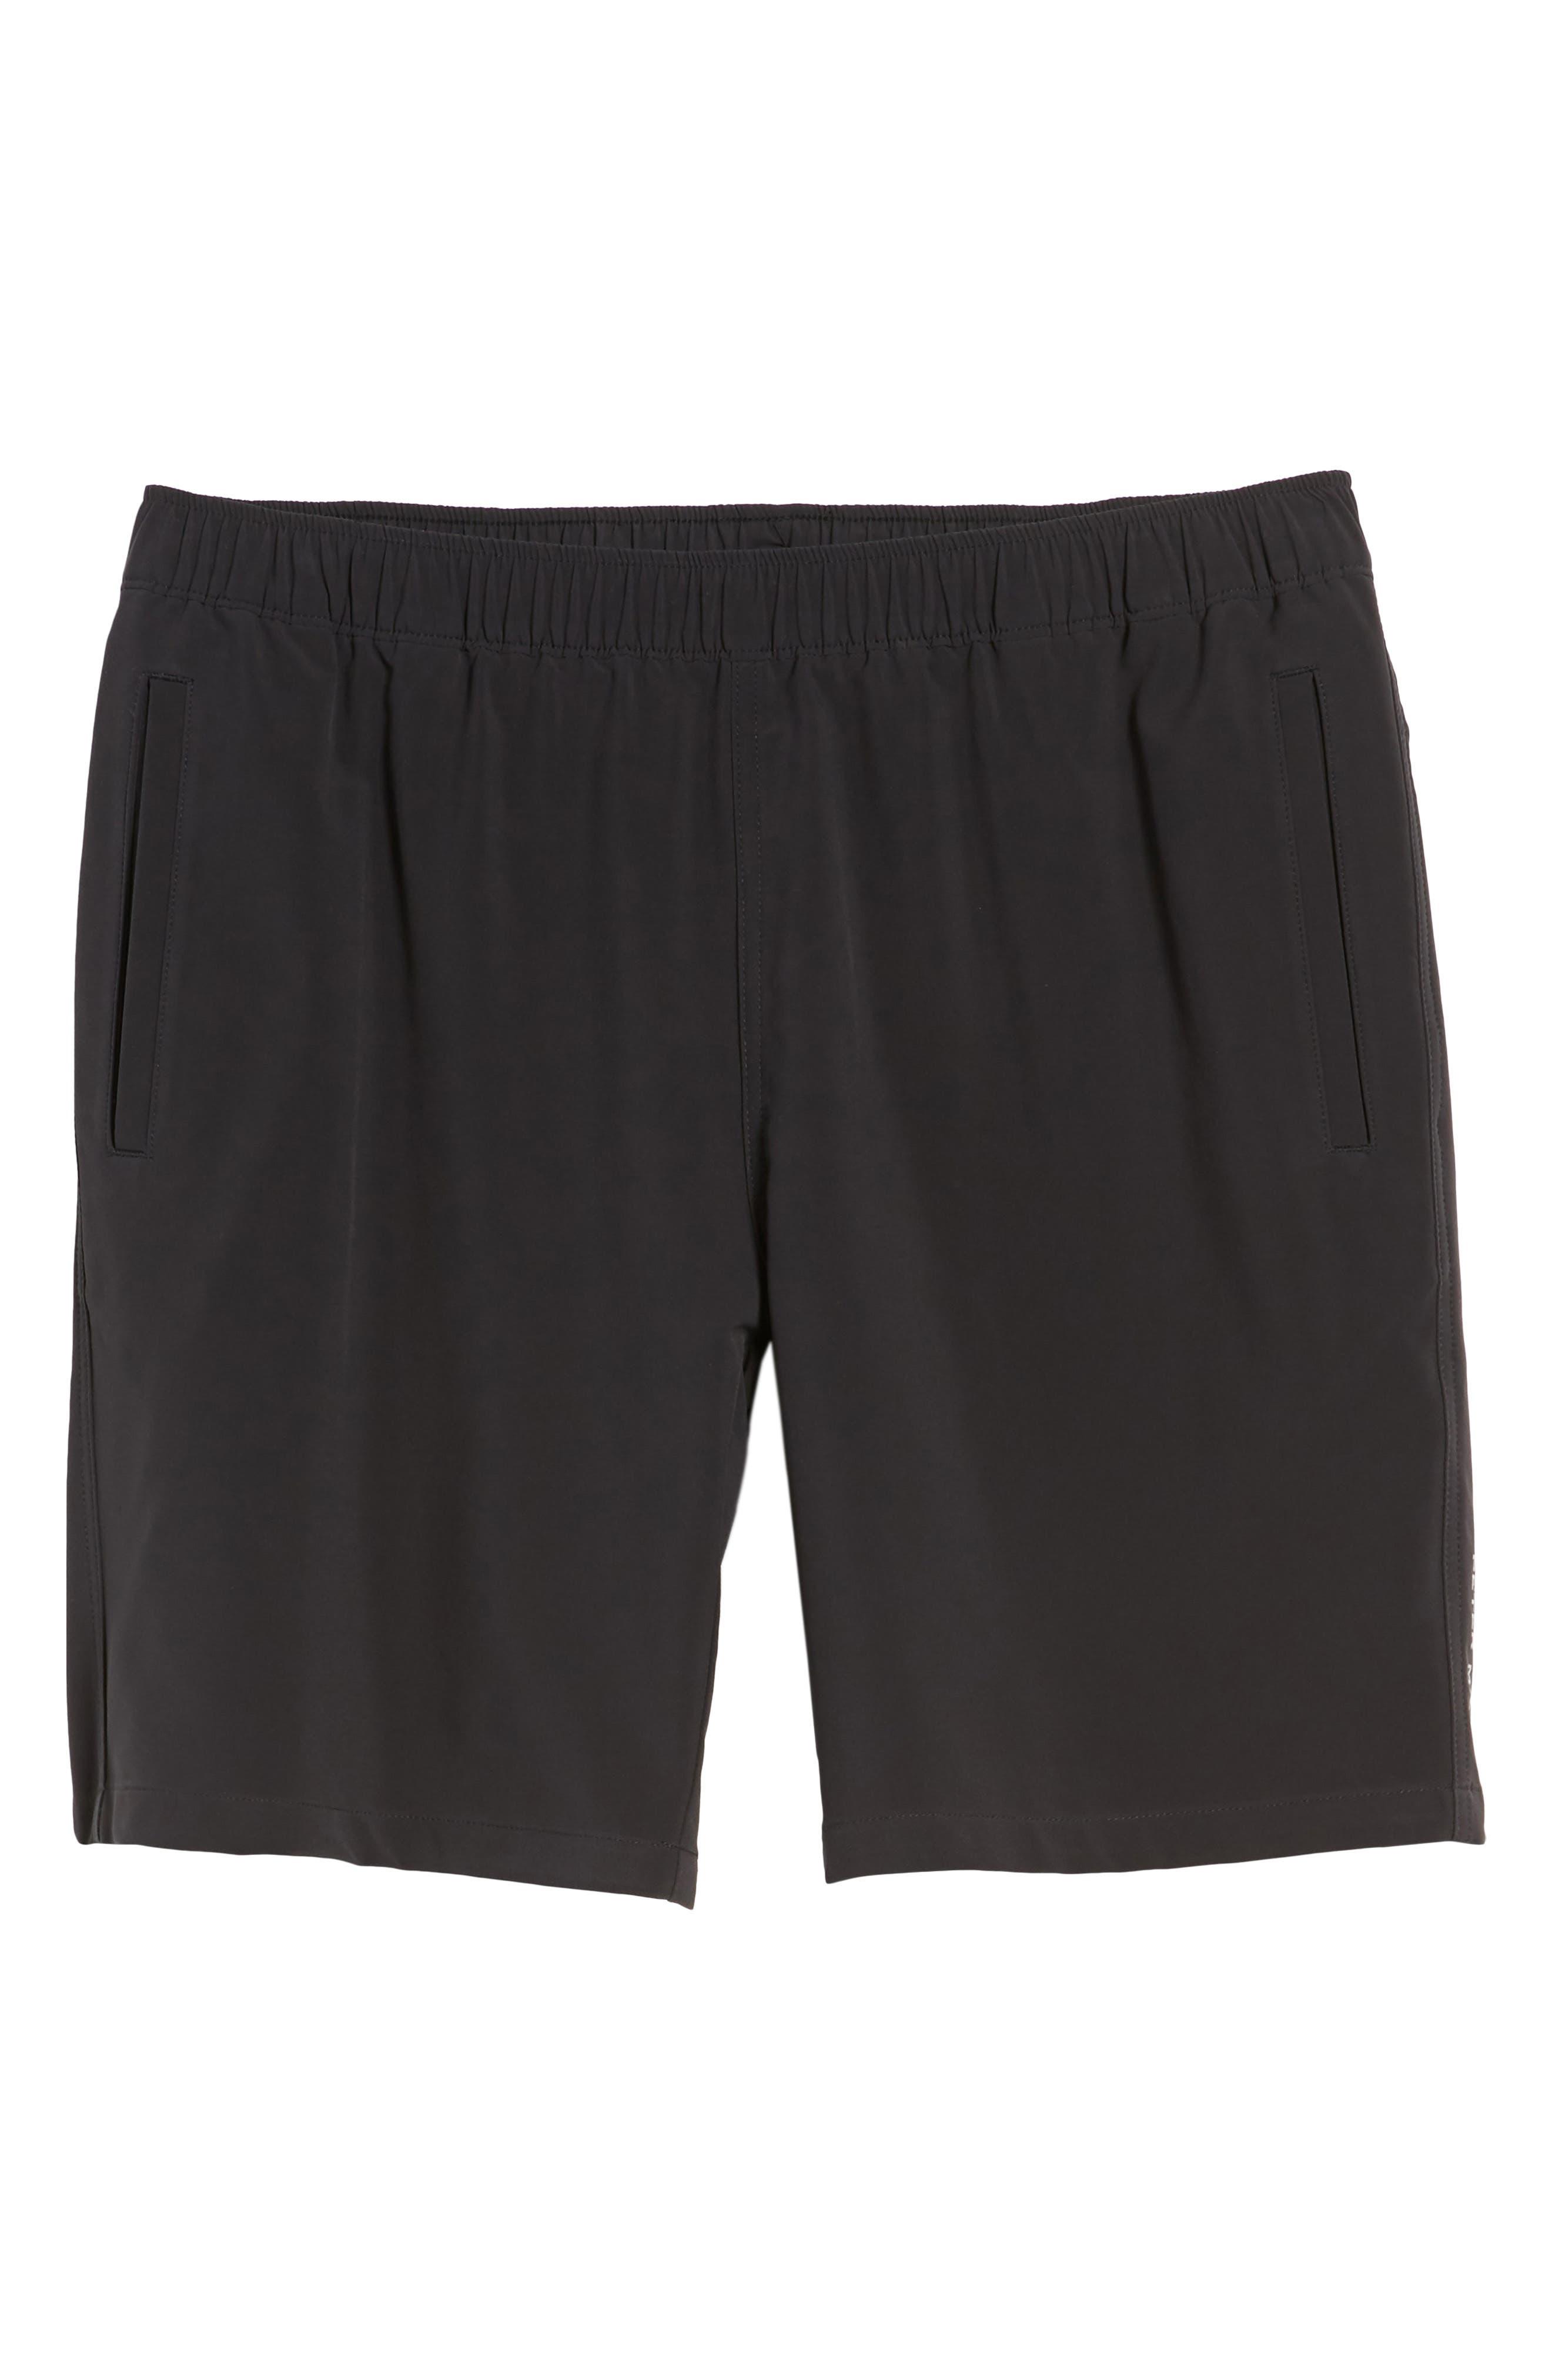 Oslo Sport Shorts,                             Alternate thumbnail 6, color,                             Black